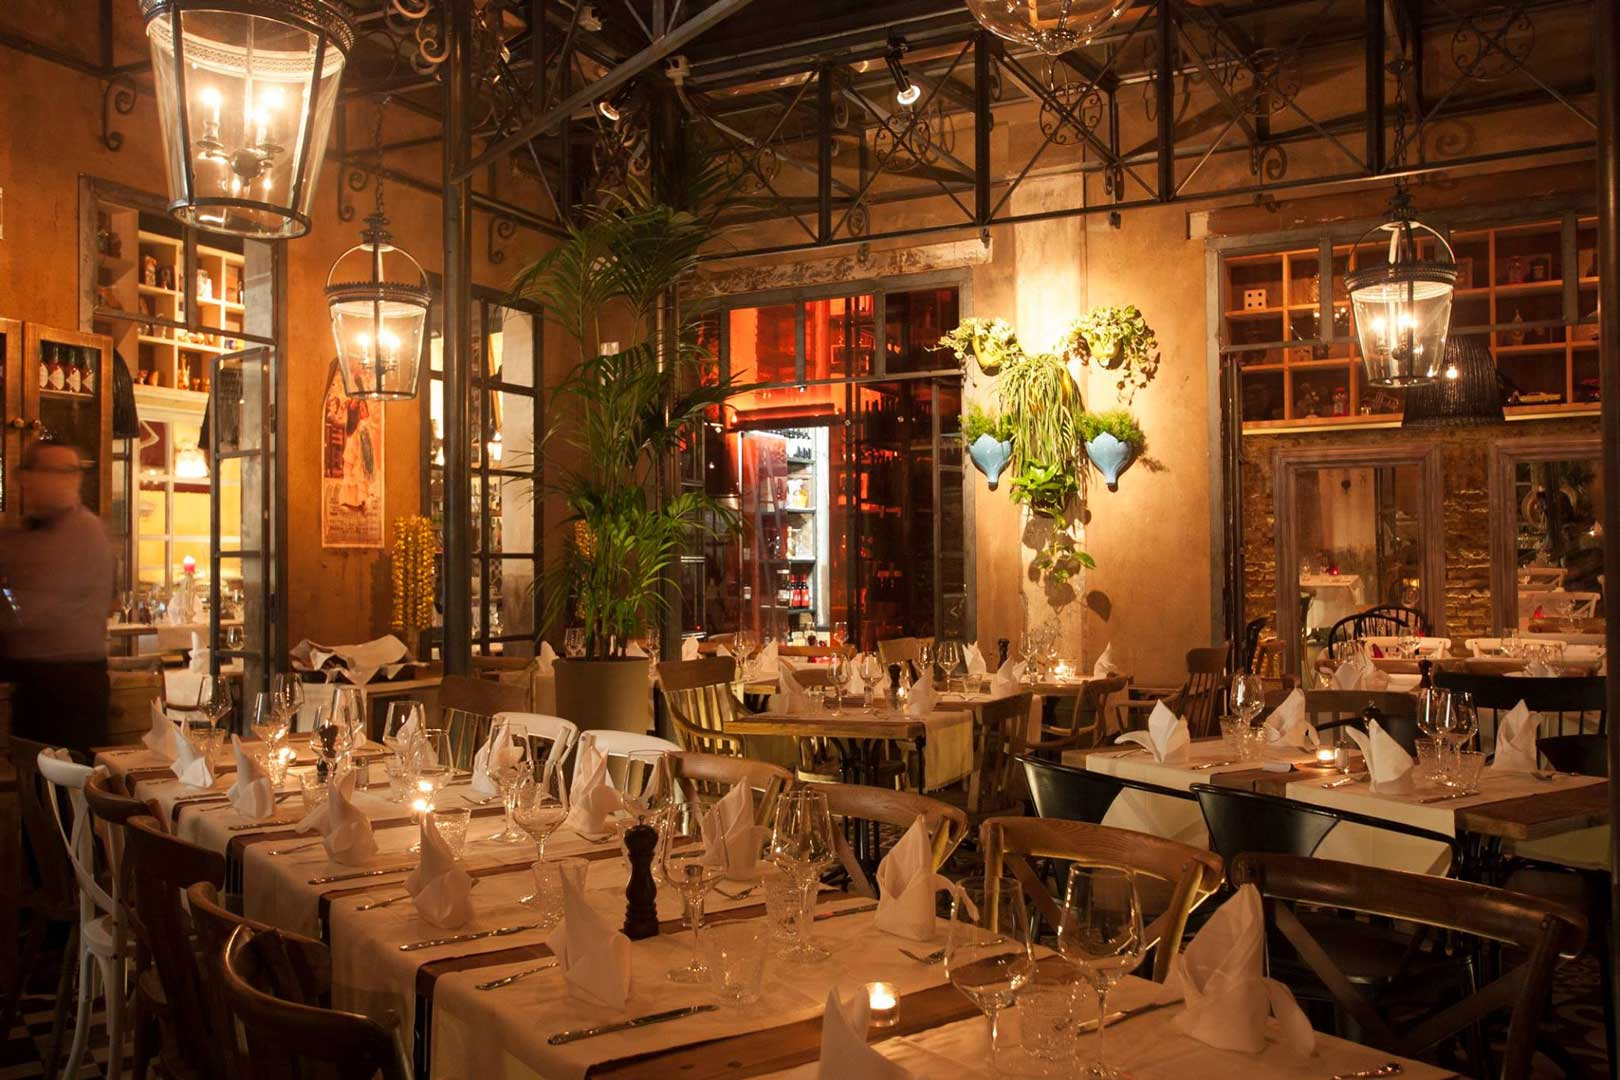 I 10 migliori ristoranti di carne a Milano